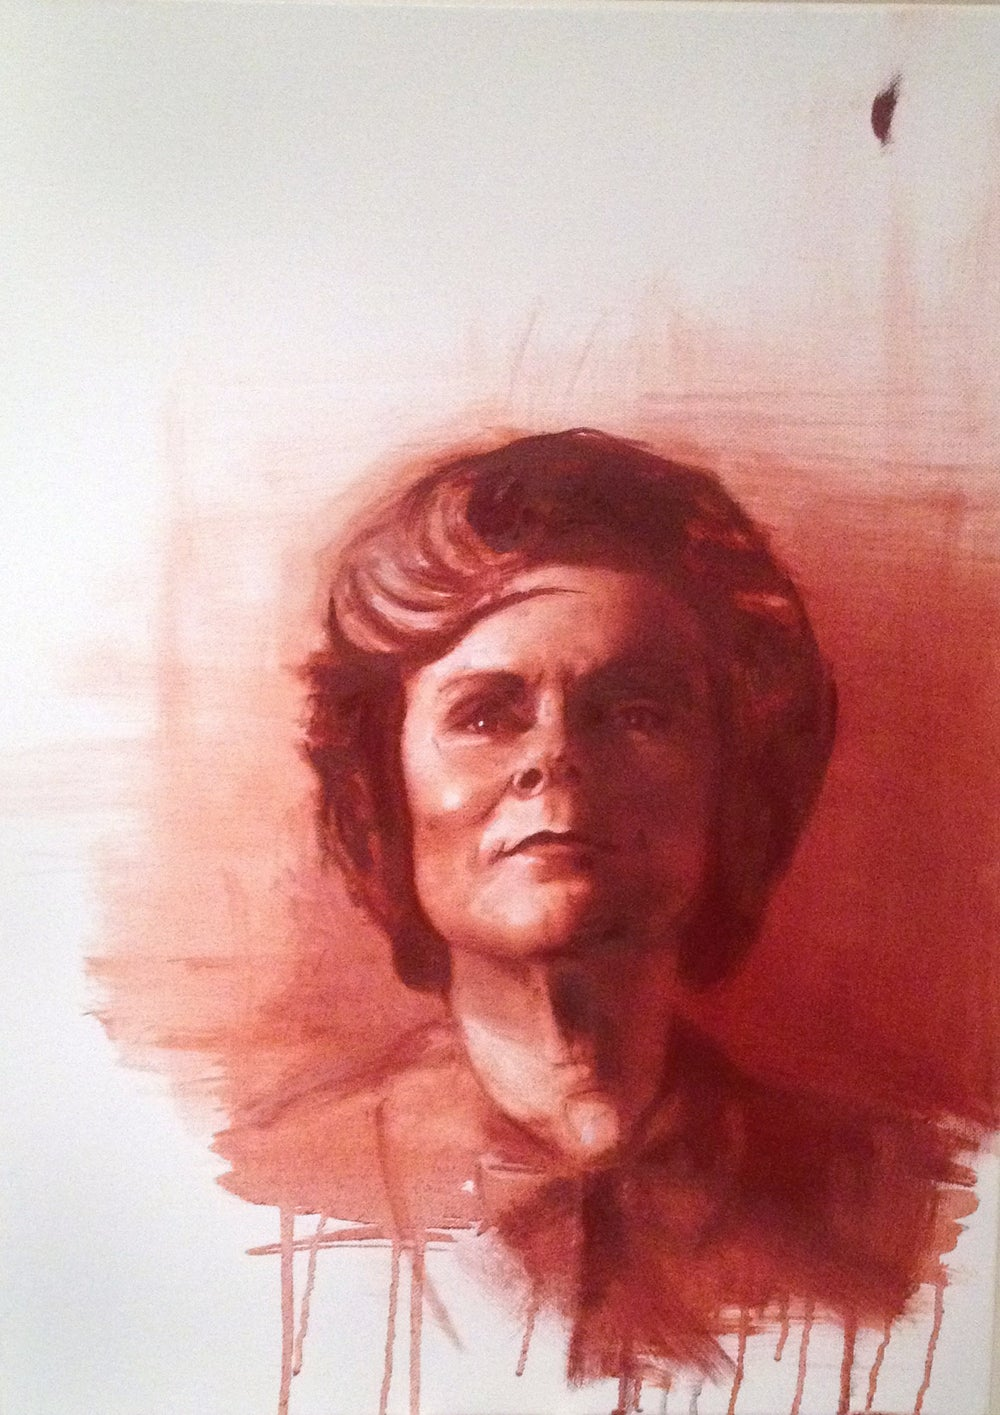 Image of Dolores Umbridge